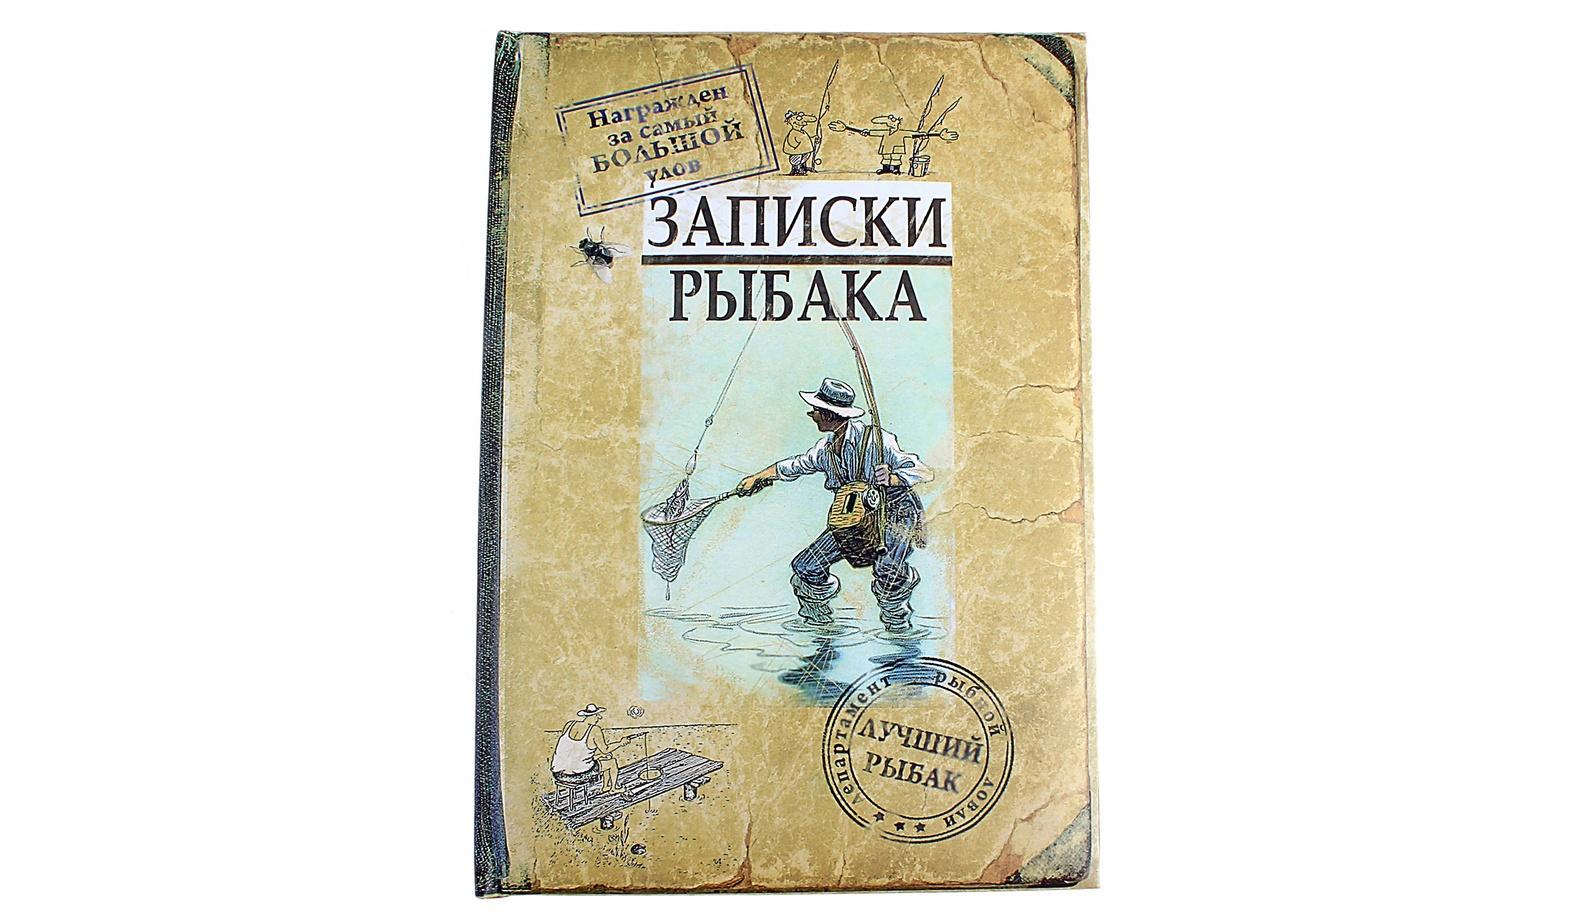 автор записки рыбака